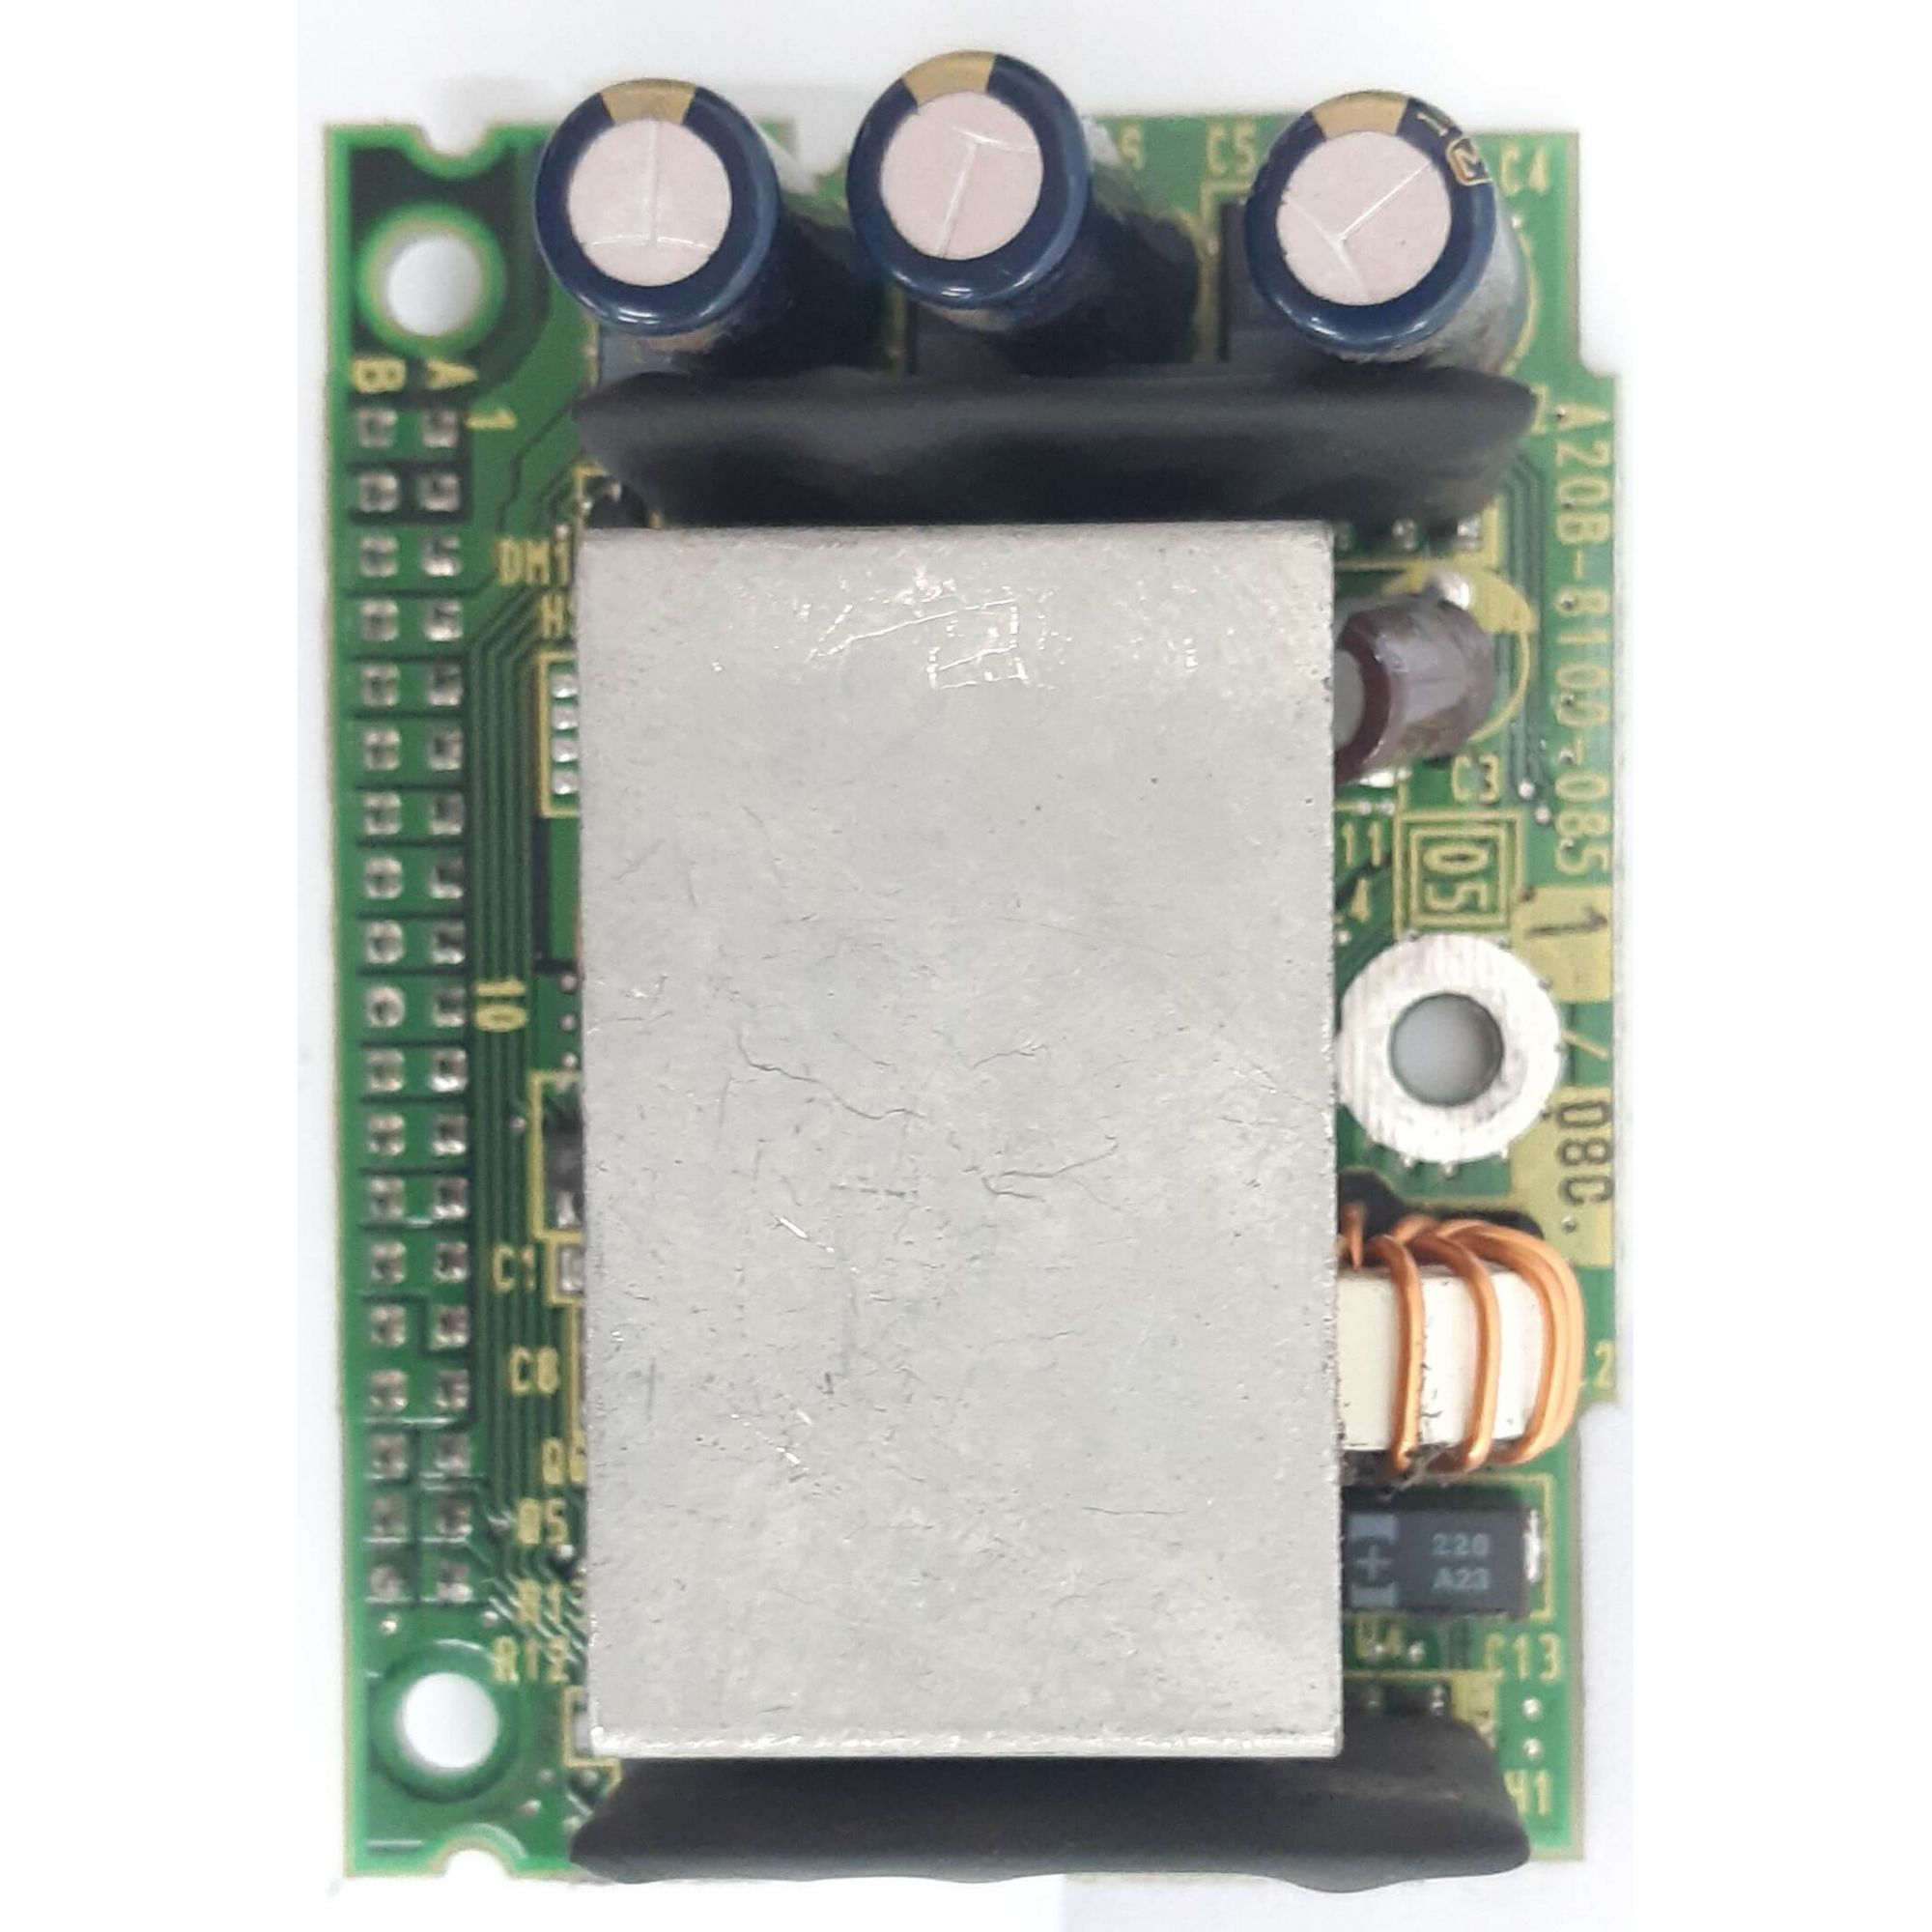 A20B-8100-0851 | PLACA FONTE CNC | FANUC